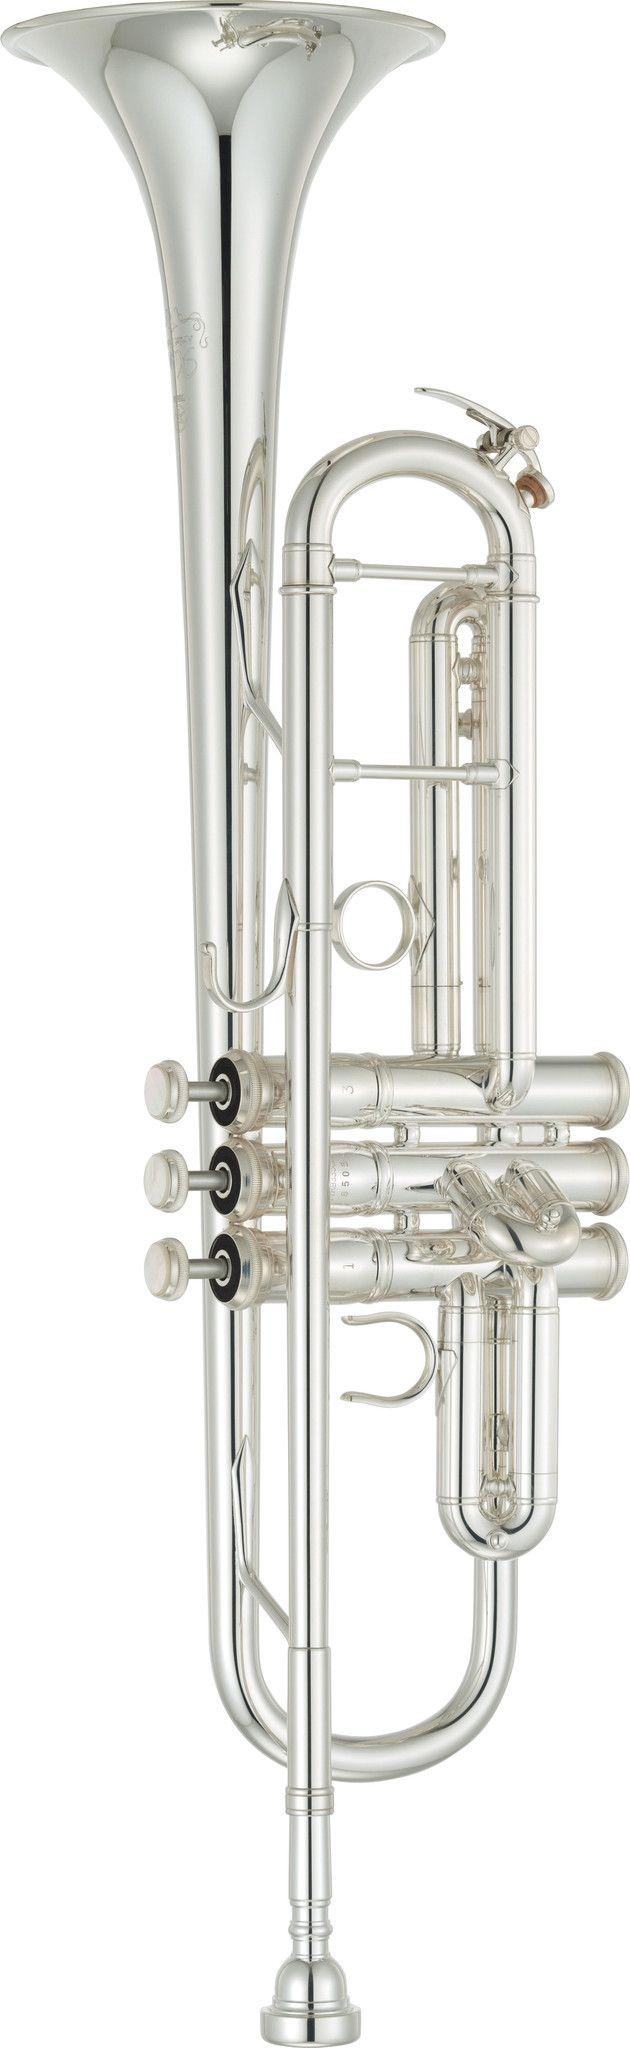 Yamaha YTR-9335CHSII John Hagstrom Design Xeno Series Bb Trumpet